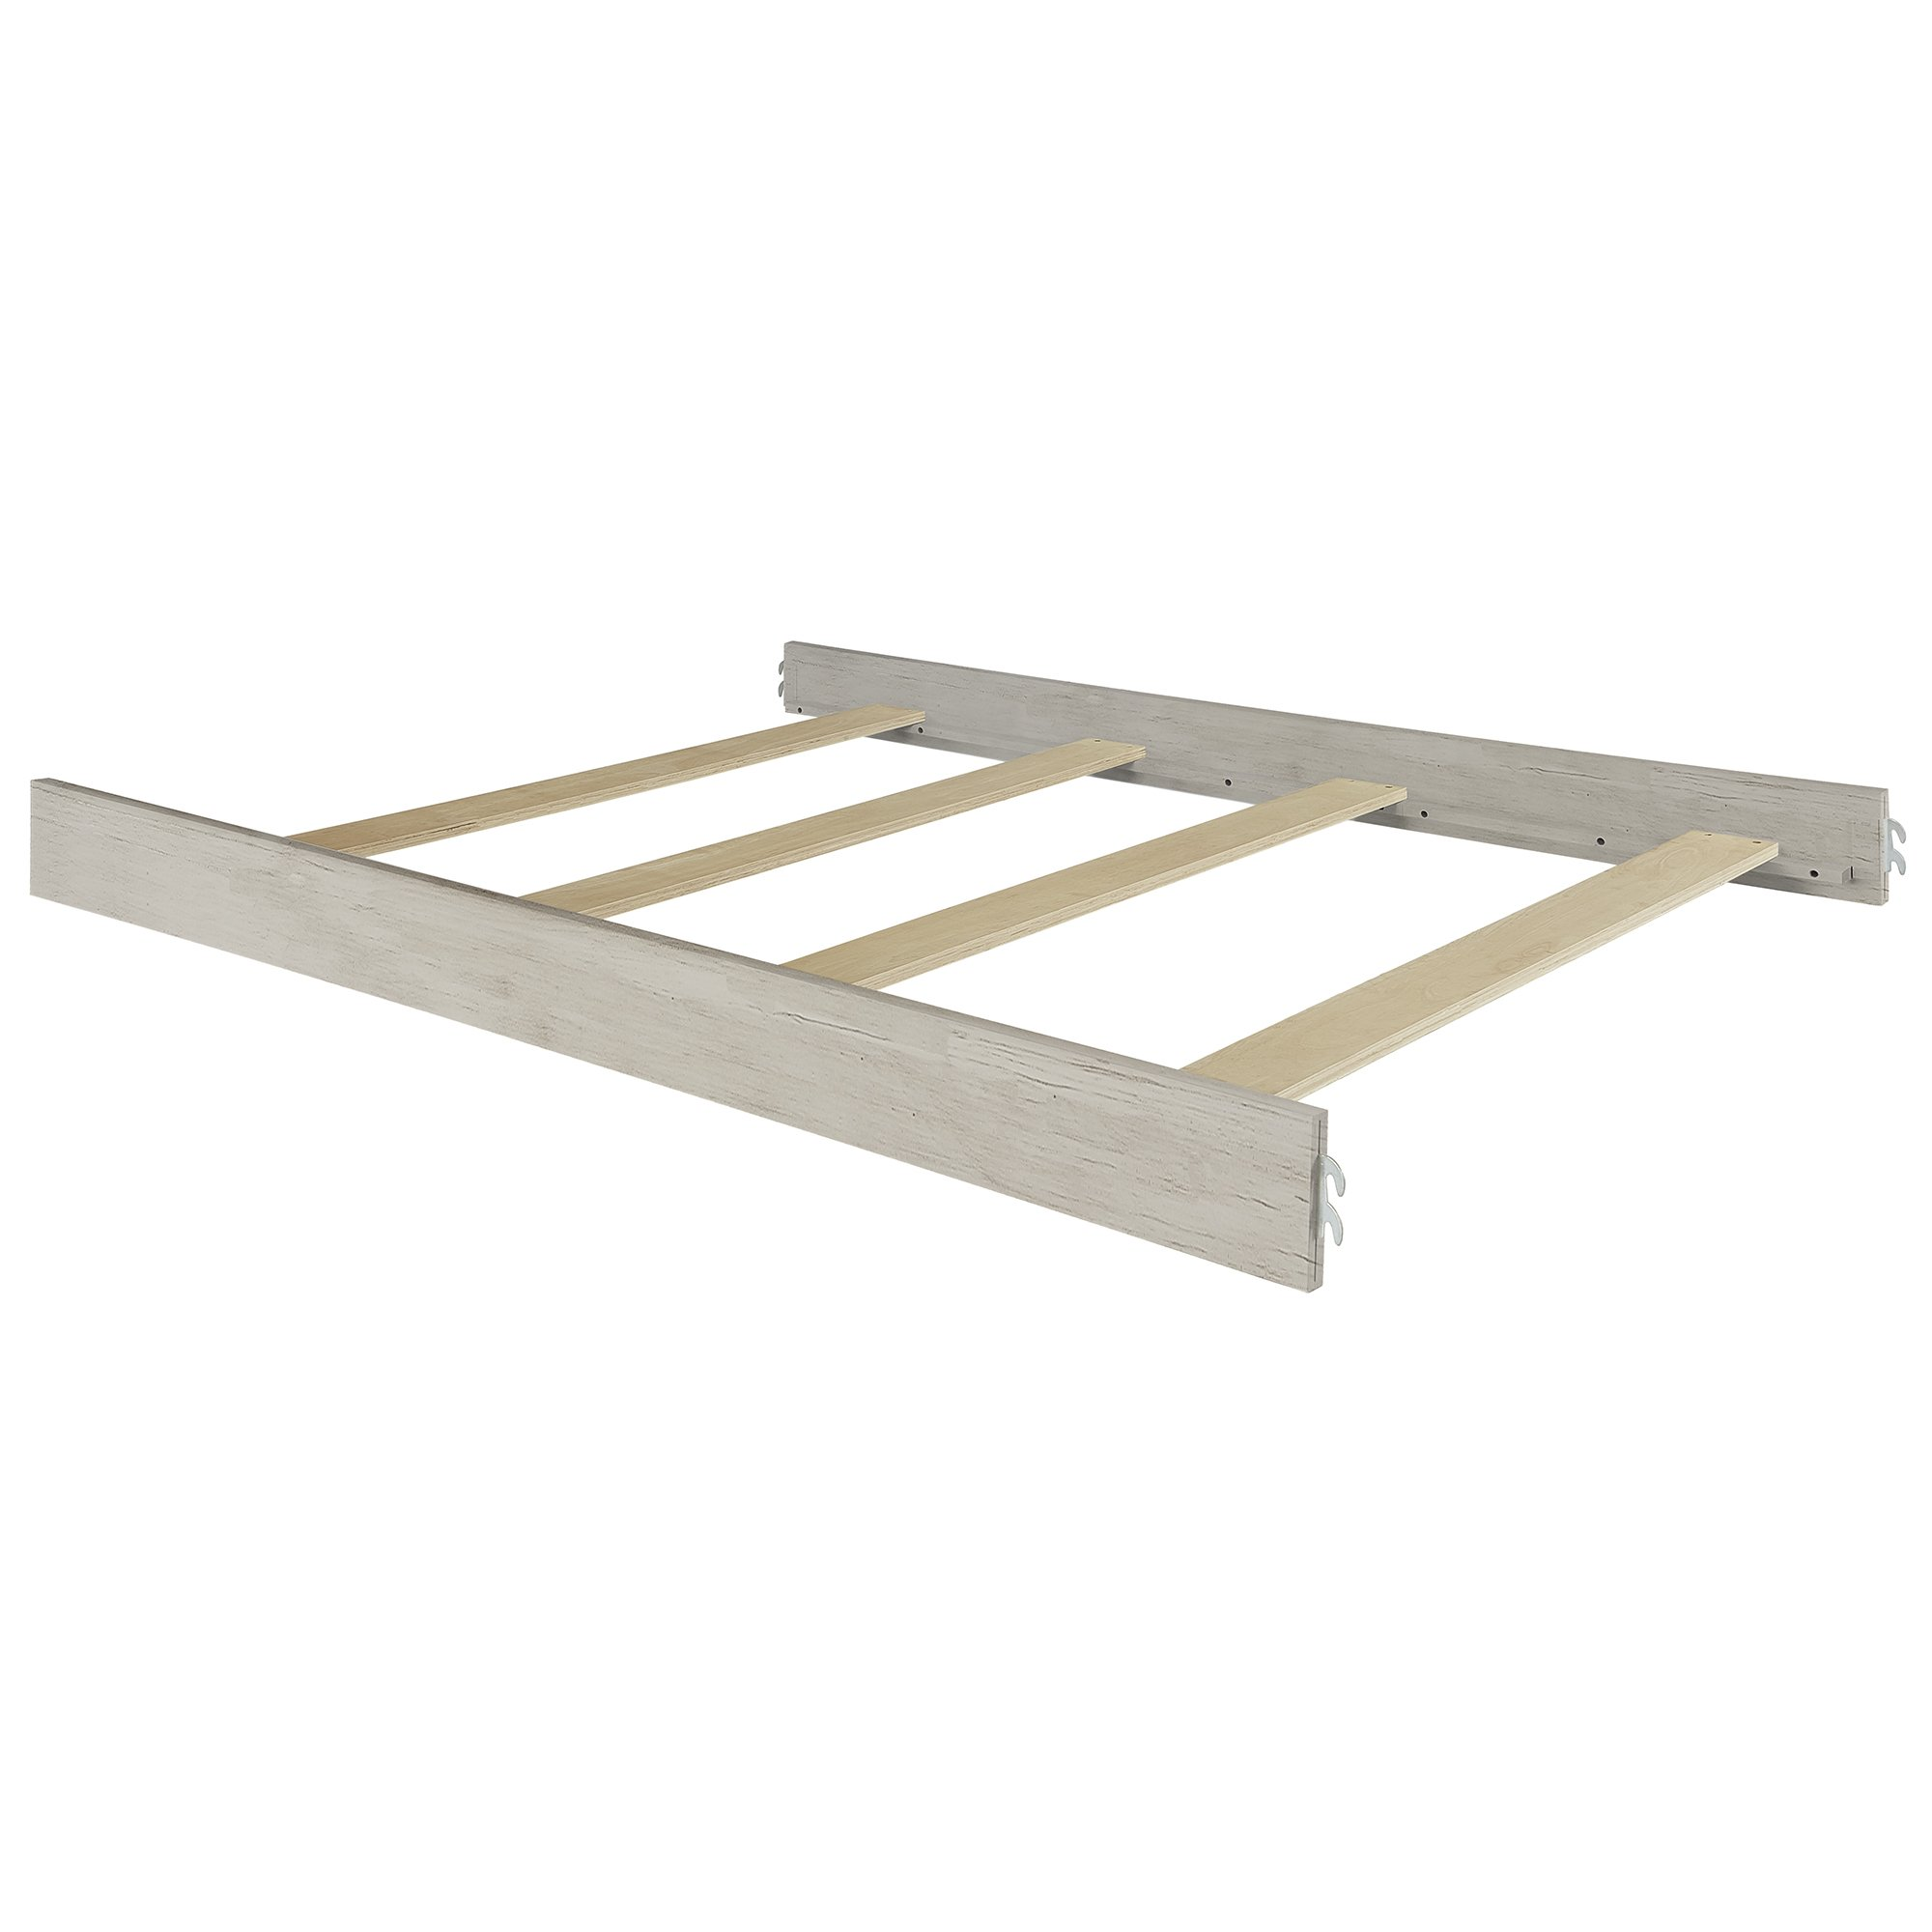 Evolur Universal Convertible Crib Wooden Full Size Bed Rail, Antique Grey Mist